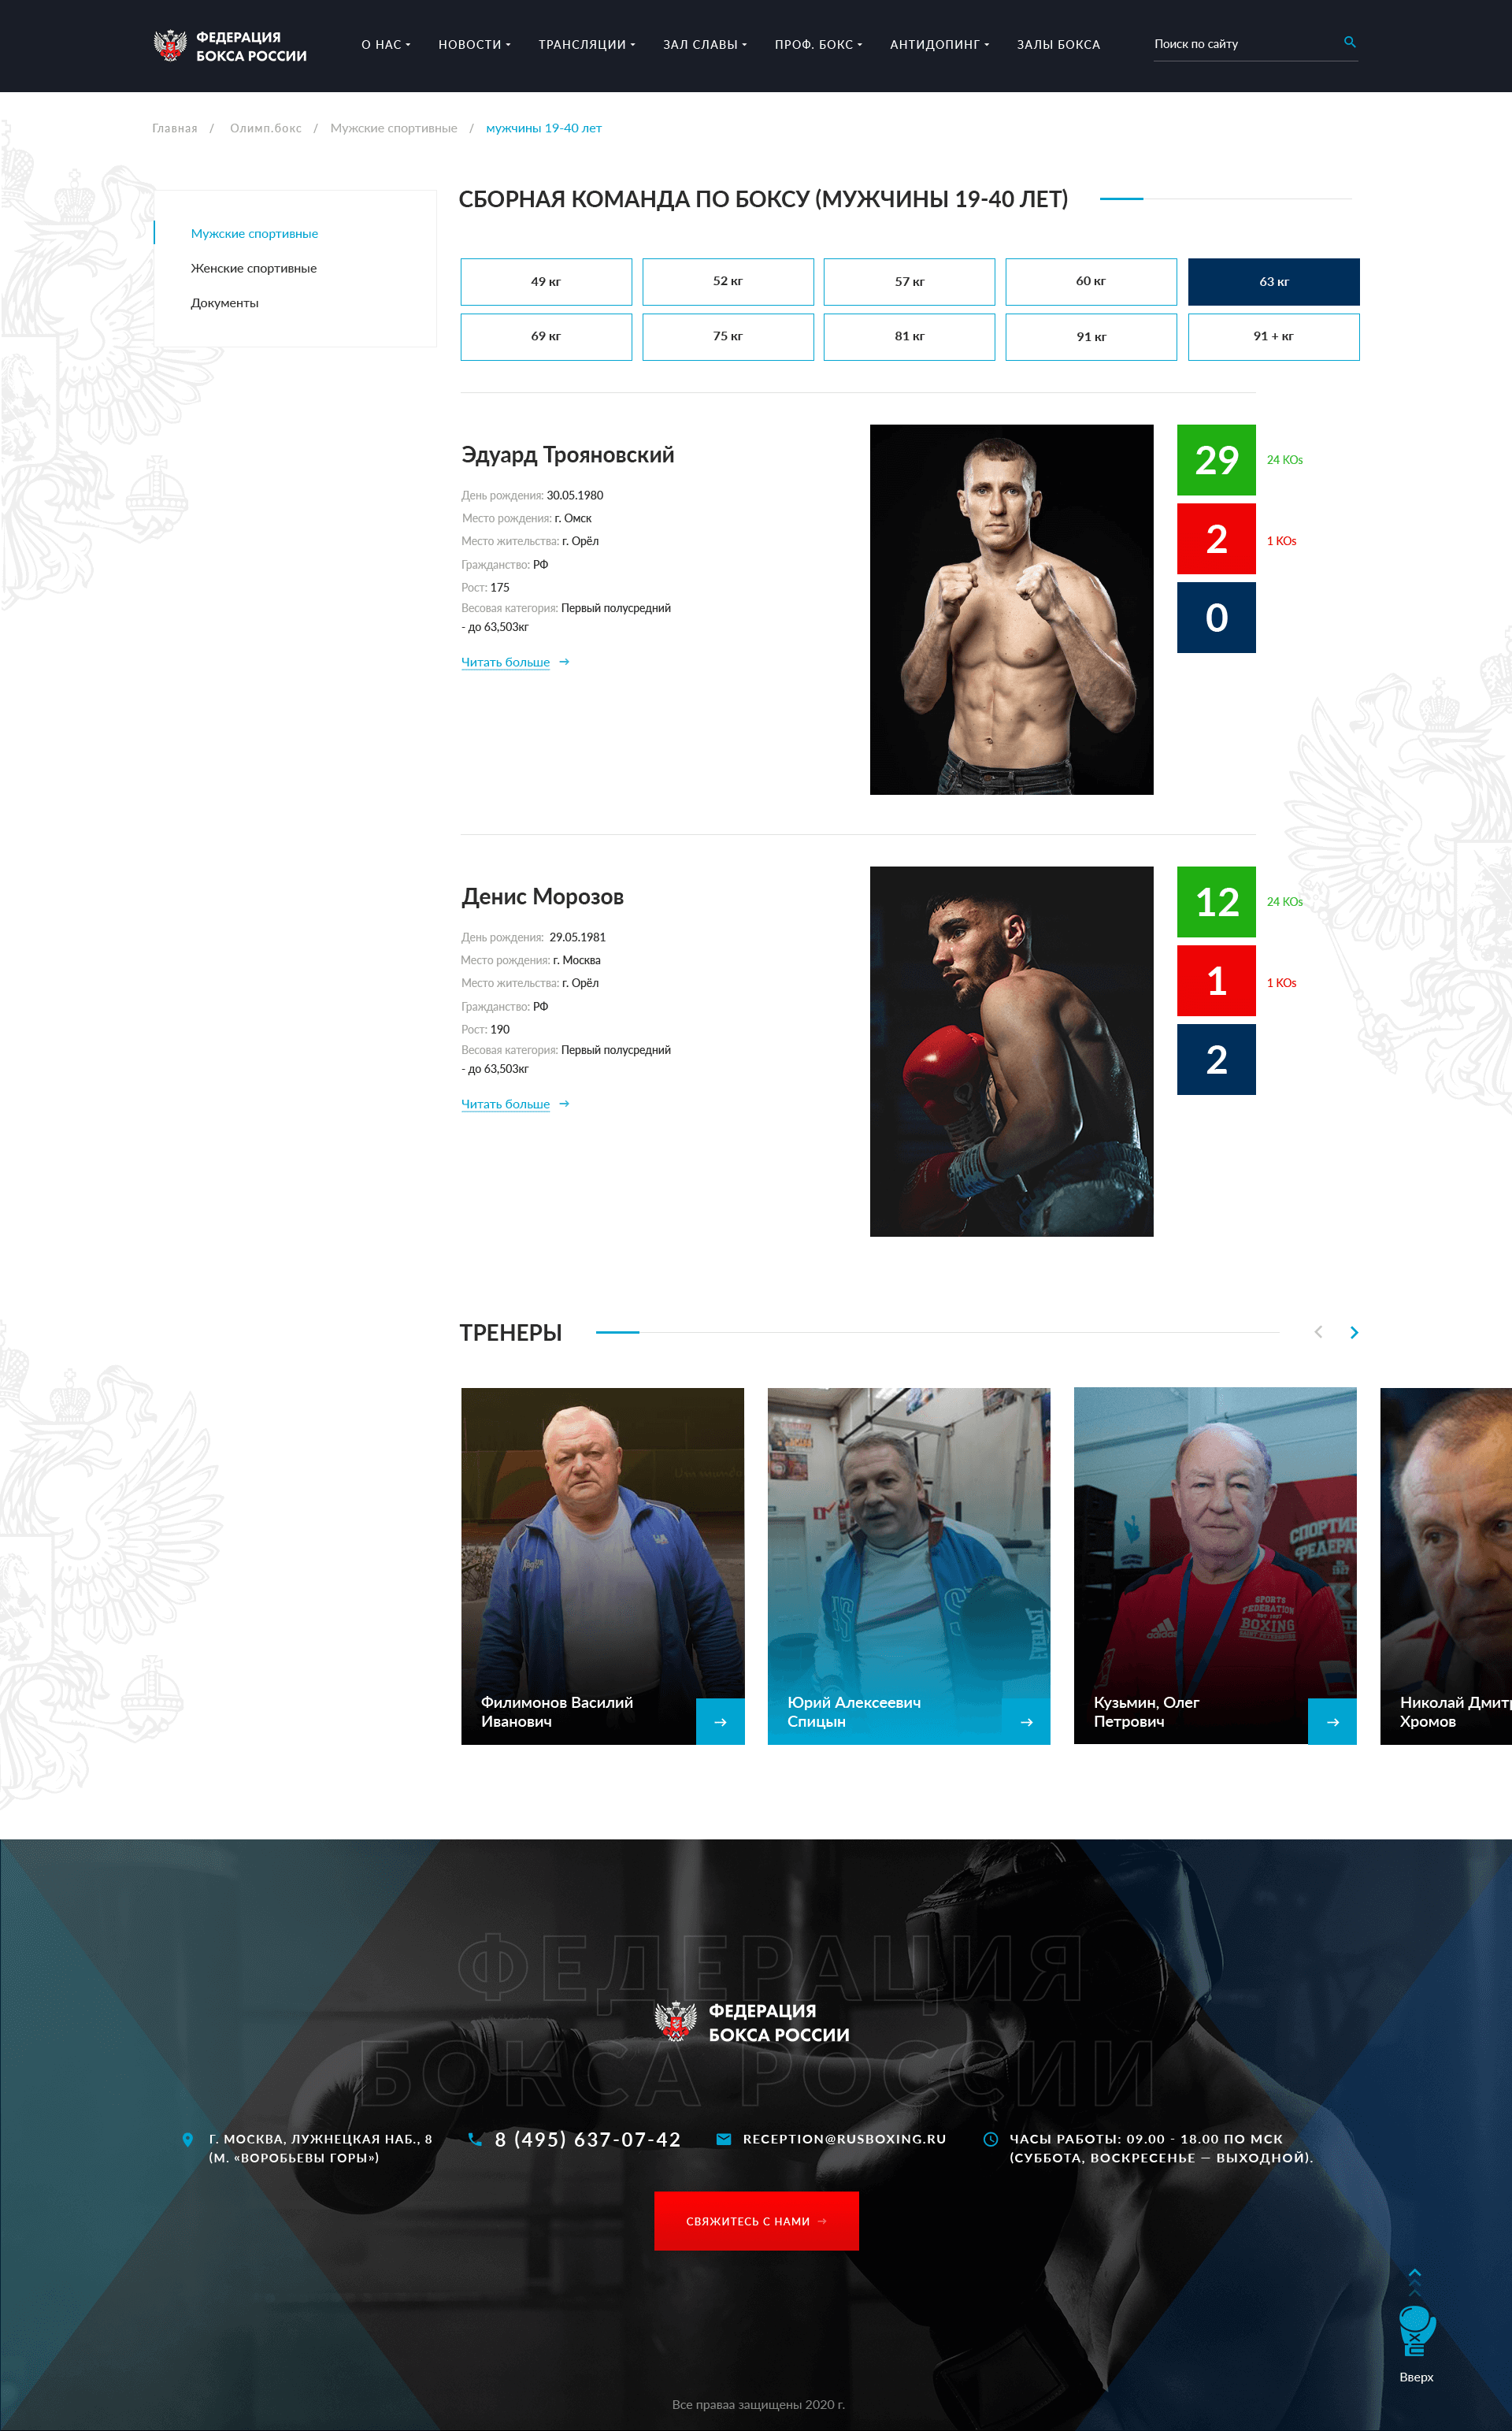 Boxing_26_Stranitsa_sbornoy_1.0